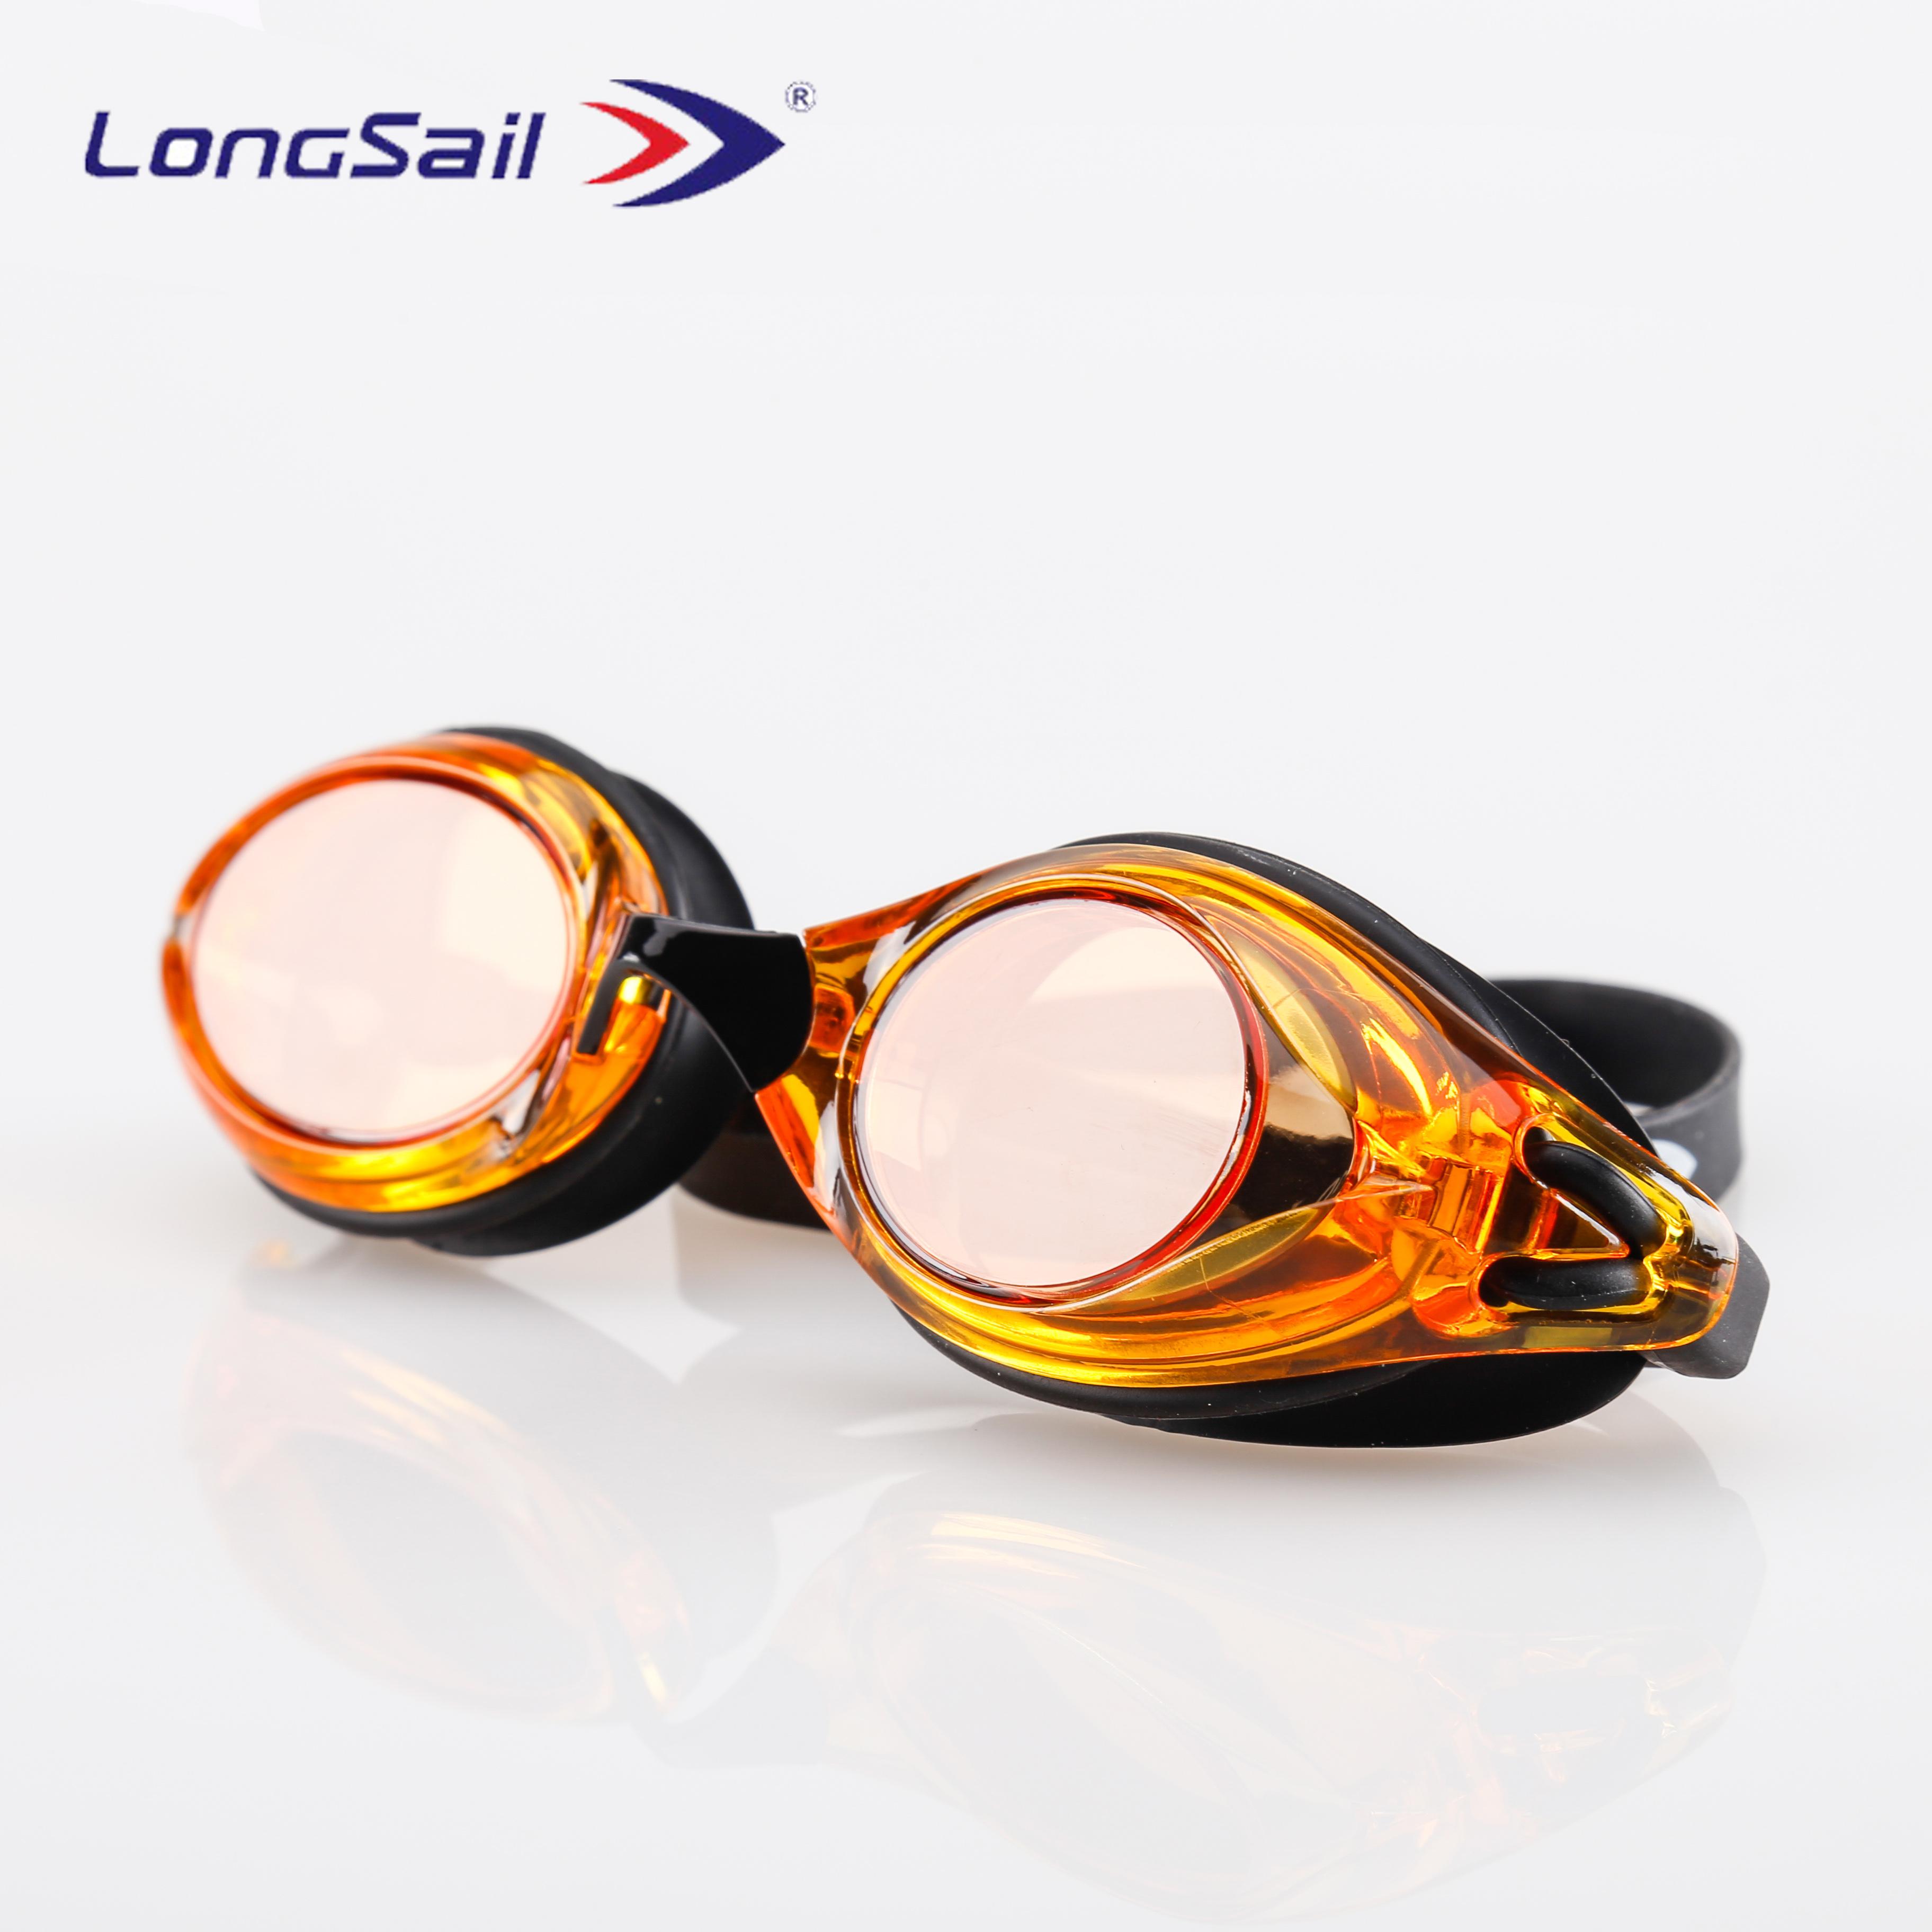 5fd6dc5c6ba Electroplated Adult Waterproof No Leak UV PC Anti Fog Swimming Goggles  Prescription